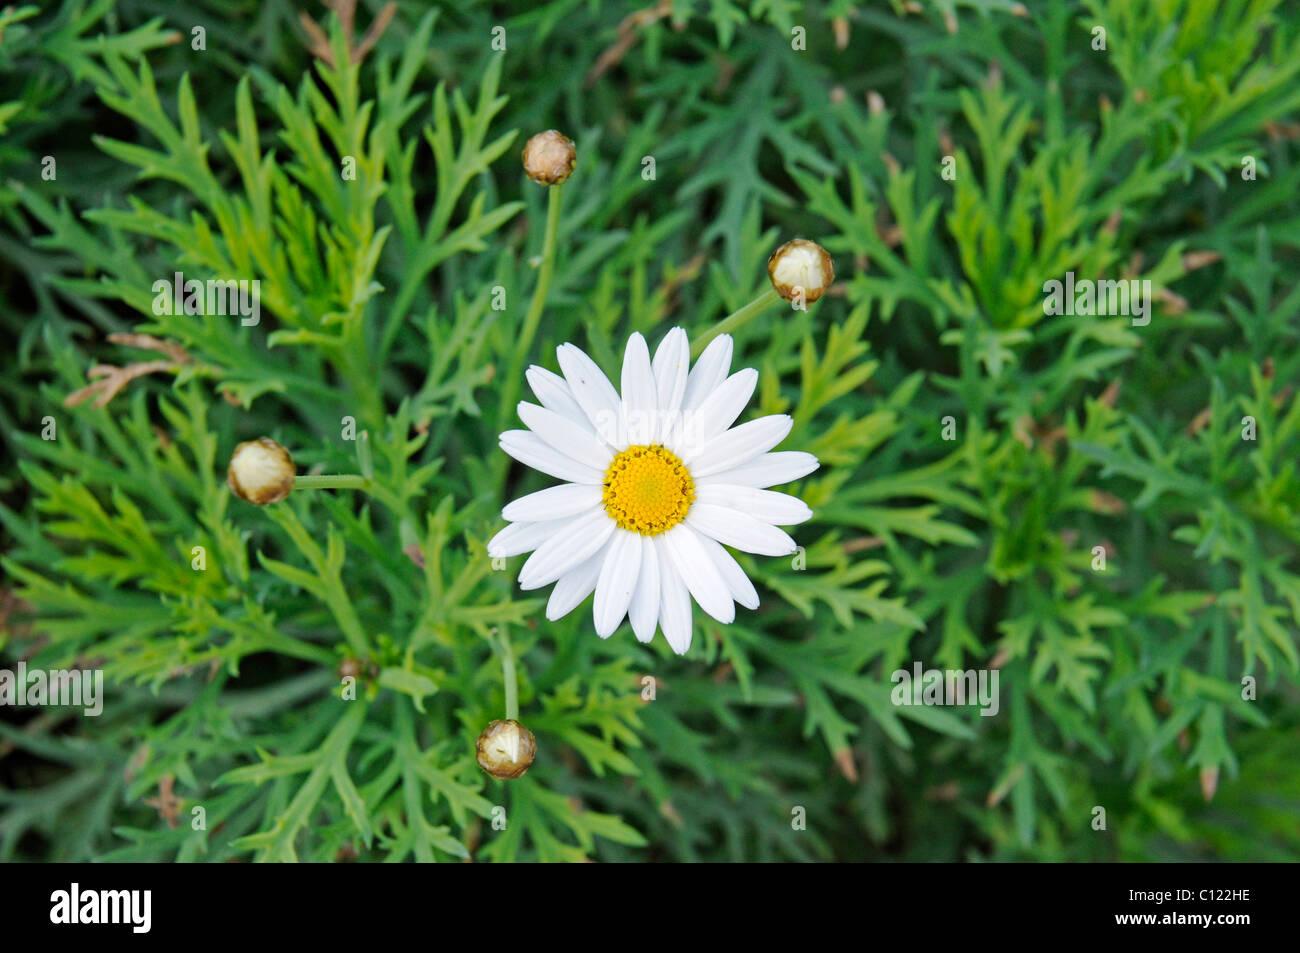 Single flower with buds stock photos single flower with buds stock marguerite or daisy single flower and buds spain europe stock image mightylinksfo